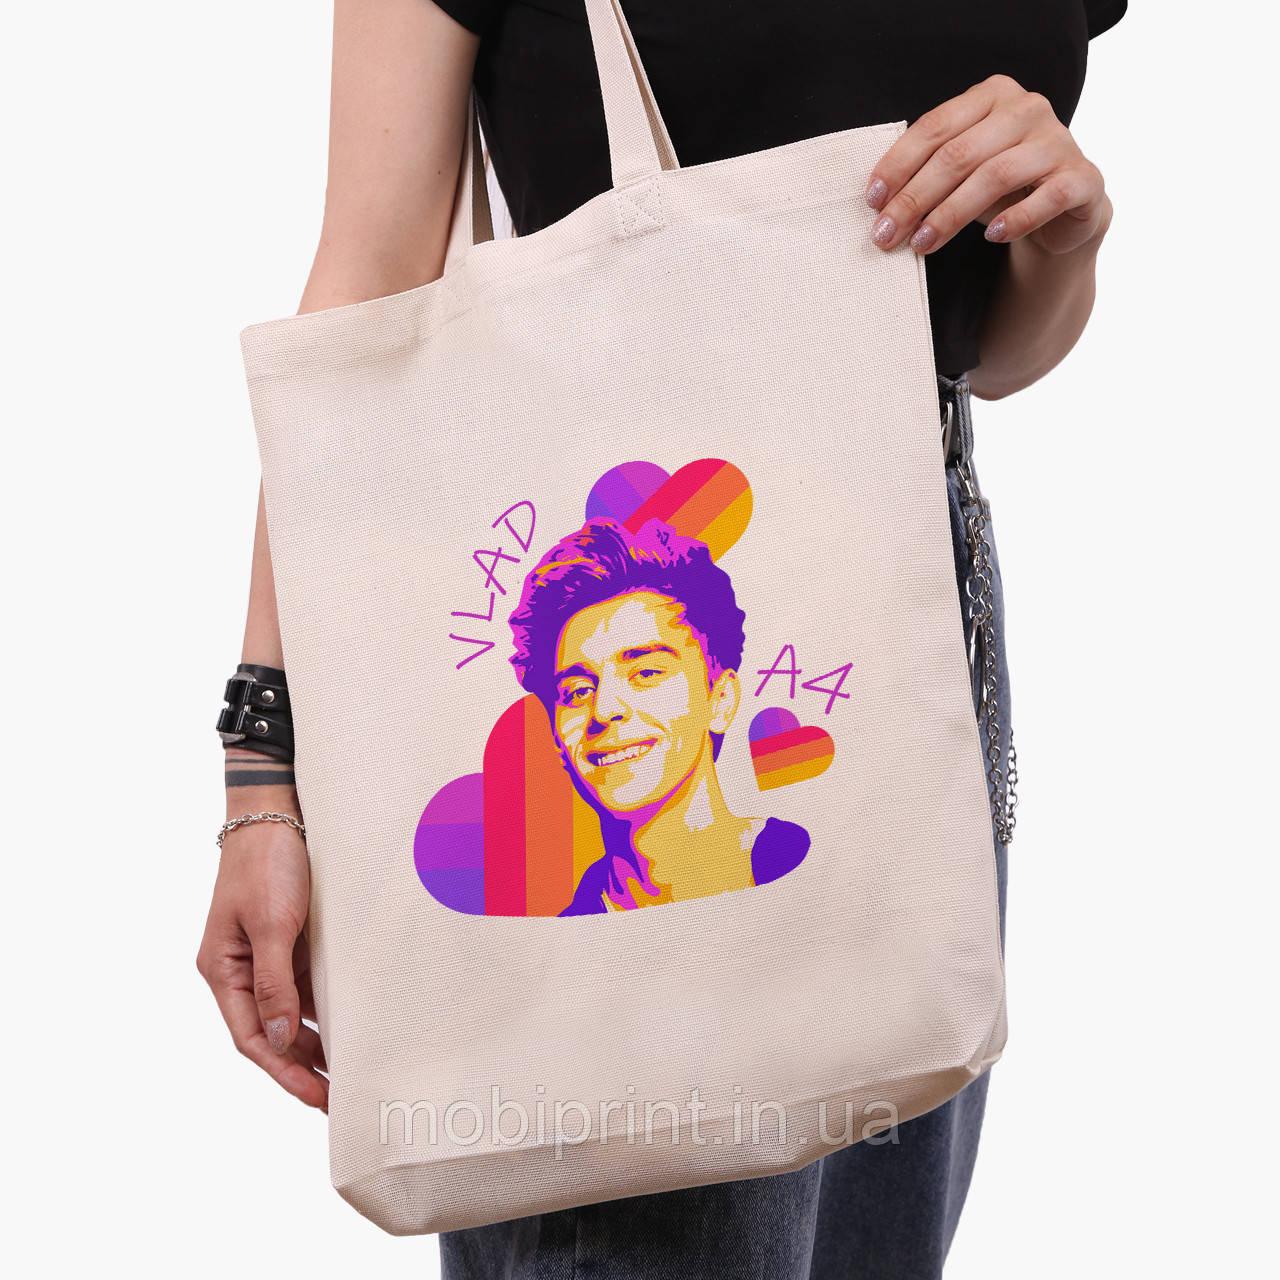 Эко сумка шоппер белая блогер Влад Бумага А4 (blogger Vlad A4) (9227-2622-1)  41*39*8 см